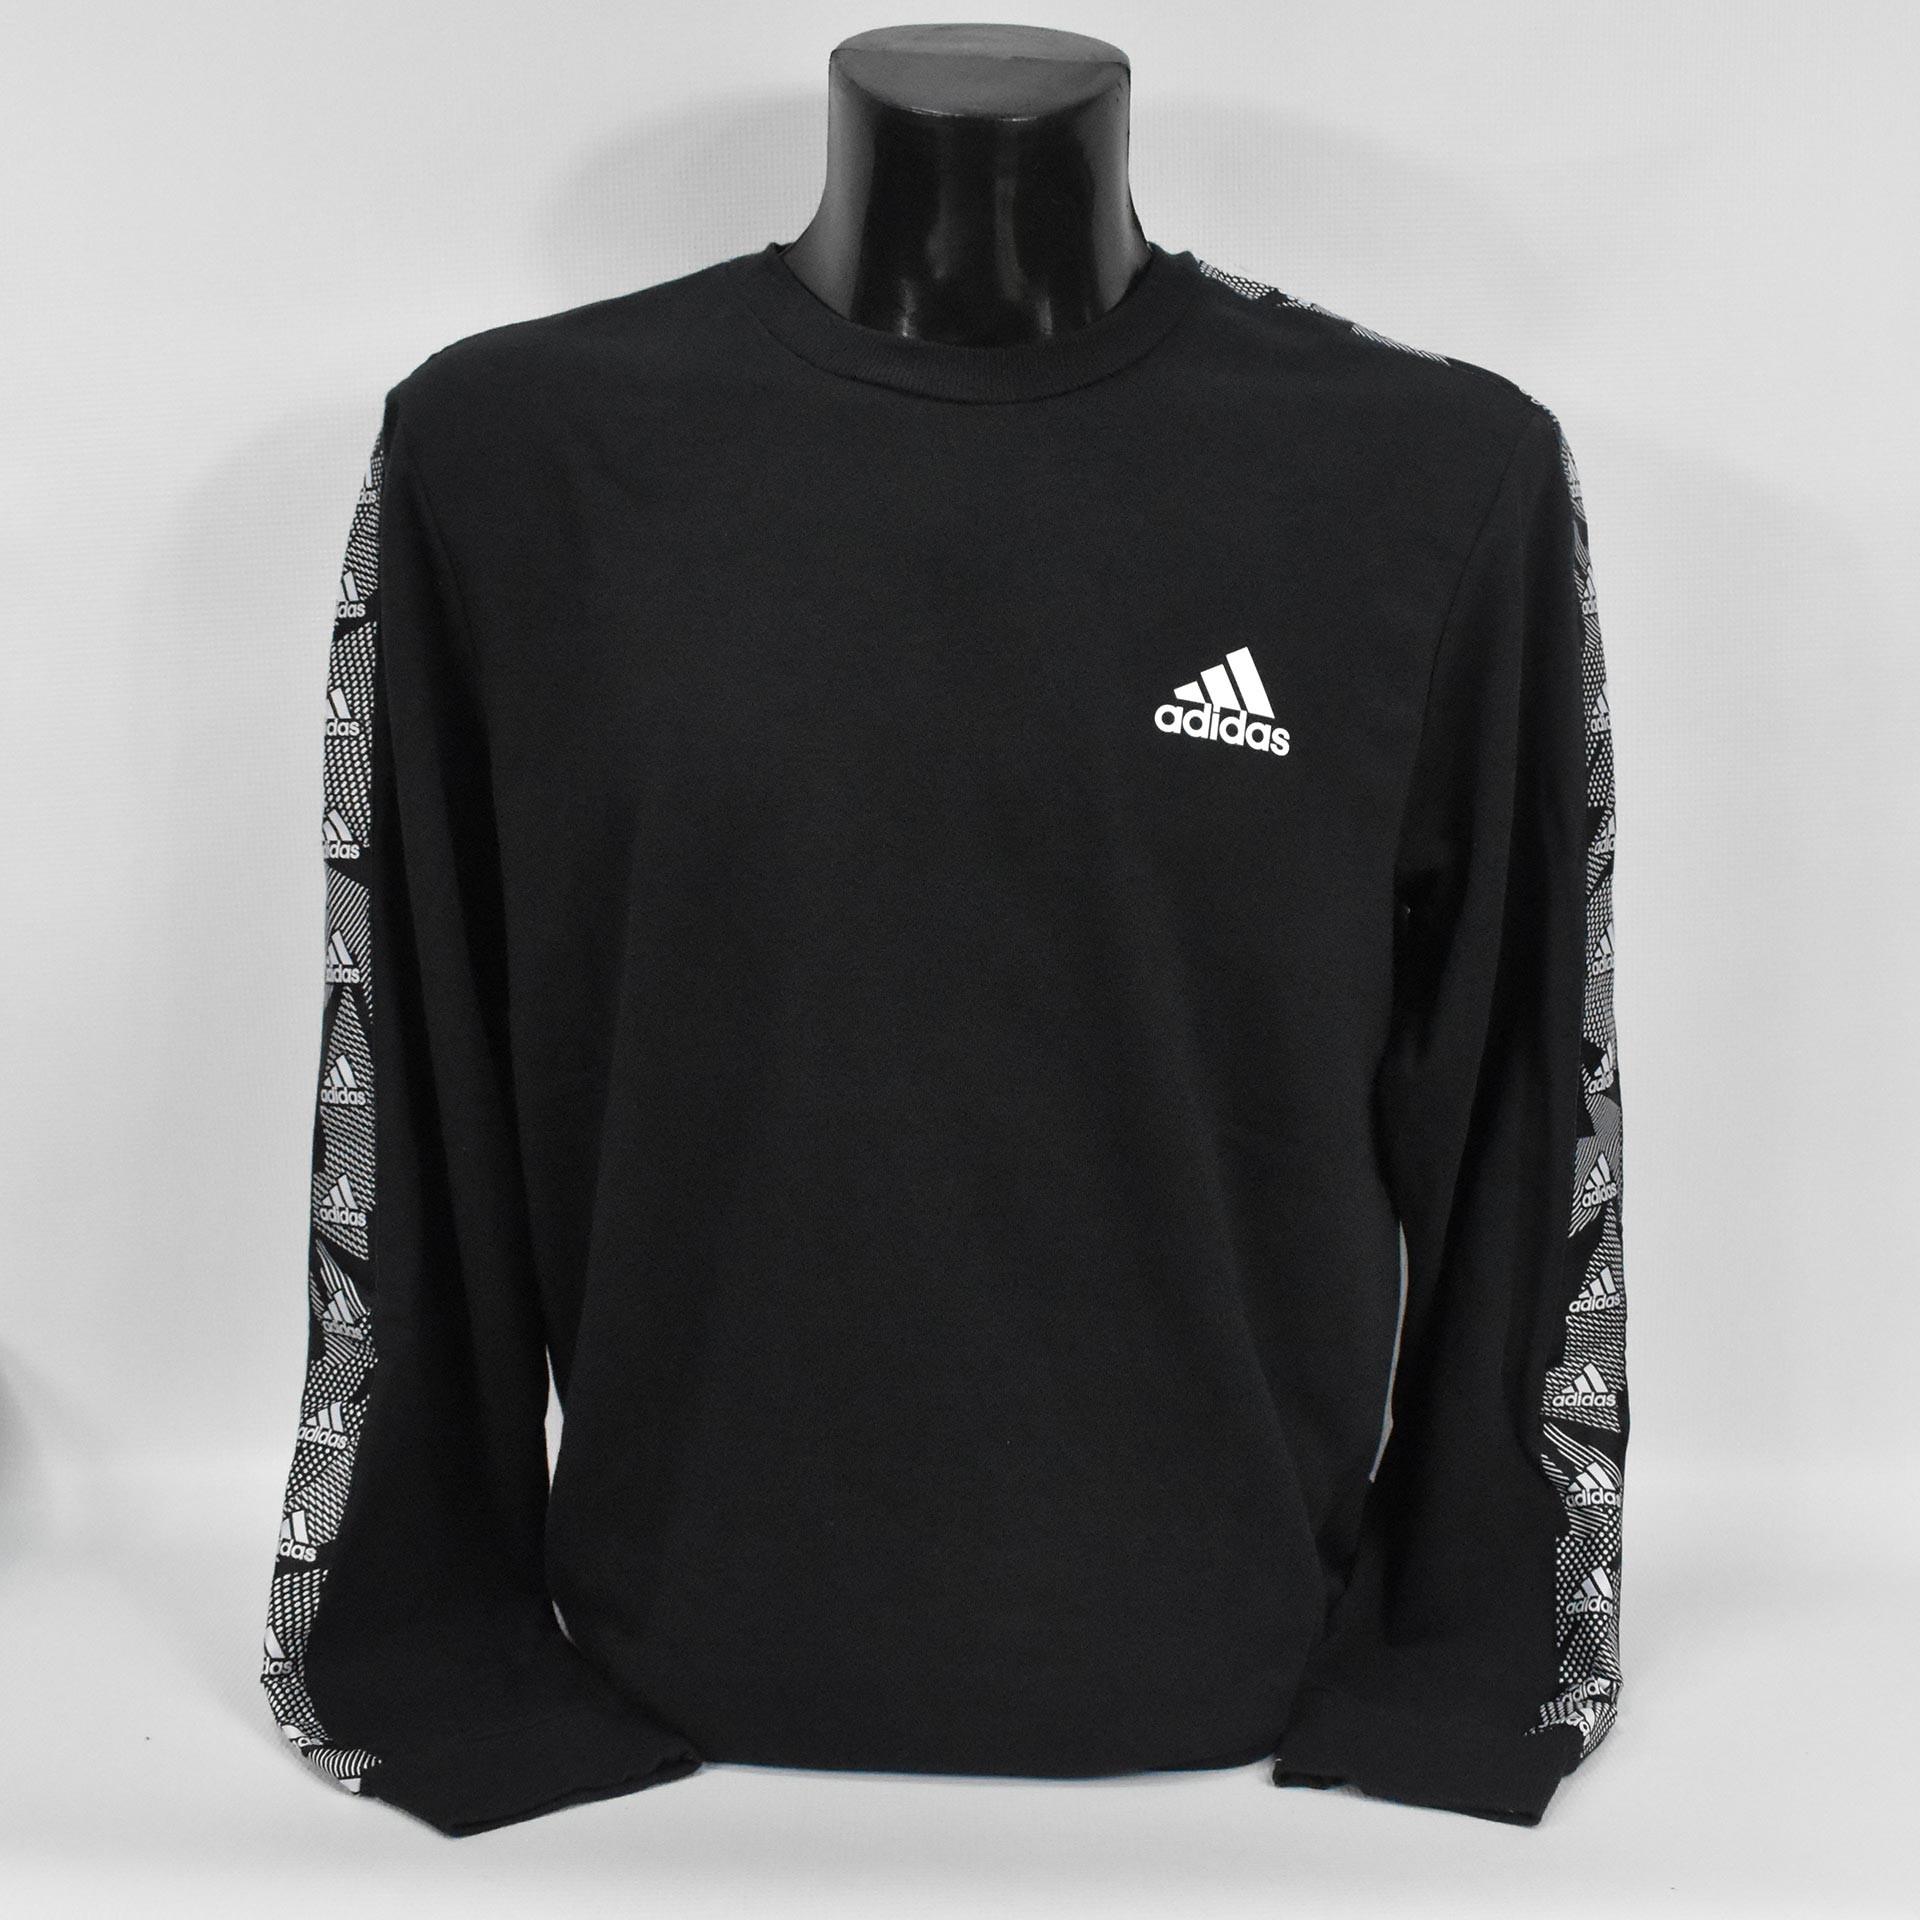 Bluza męska Adidas Essentials Tape Sweatshirt - GD5448